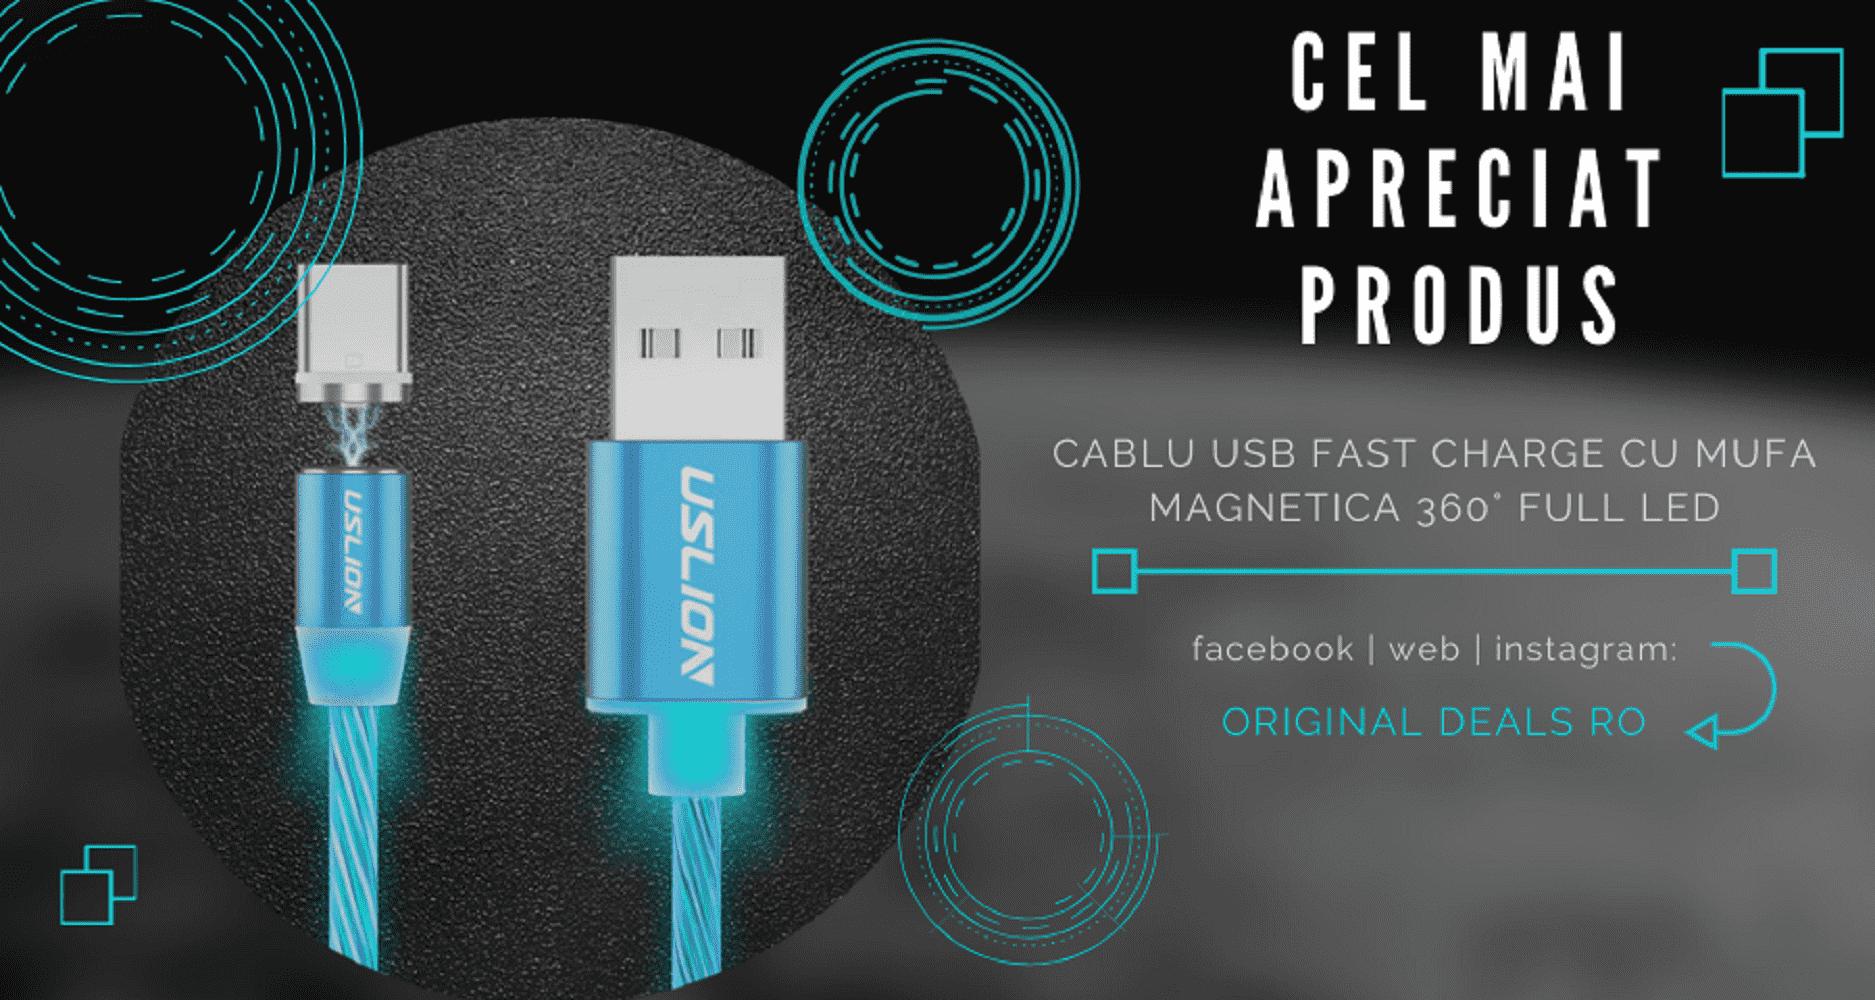 Cablu USB Fast Charge cu Mufa Magnetica 360° Neodim & Full LED